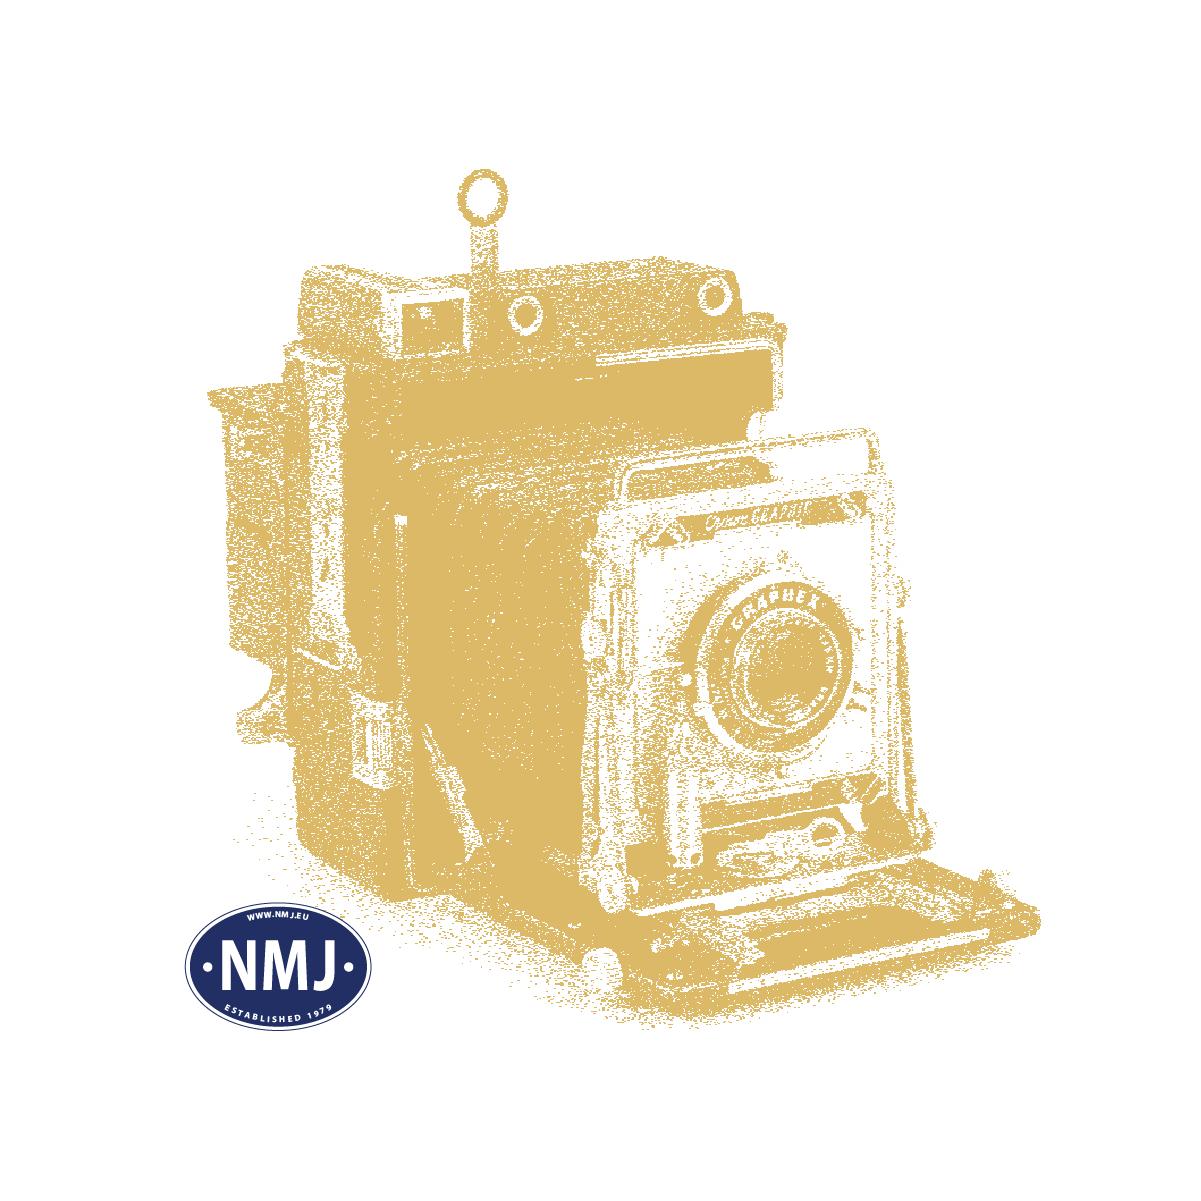 NMJT90302 - NMJ Topline CFL Diesellok 1603 (1956-1971), DC